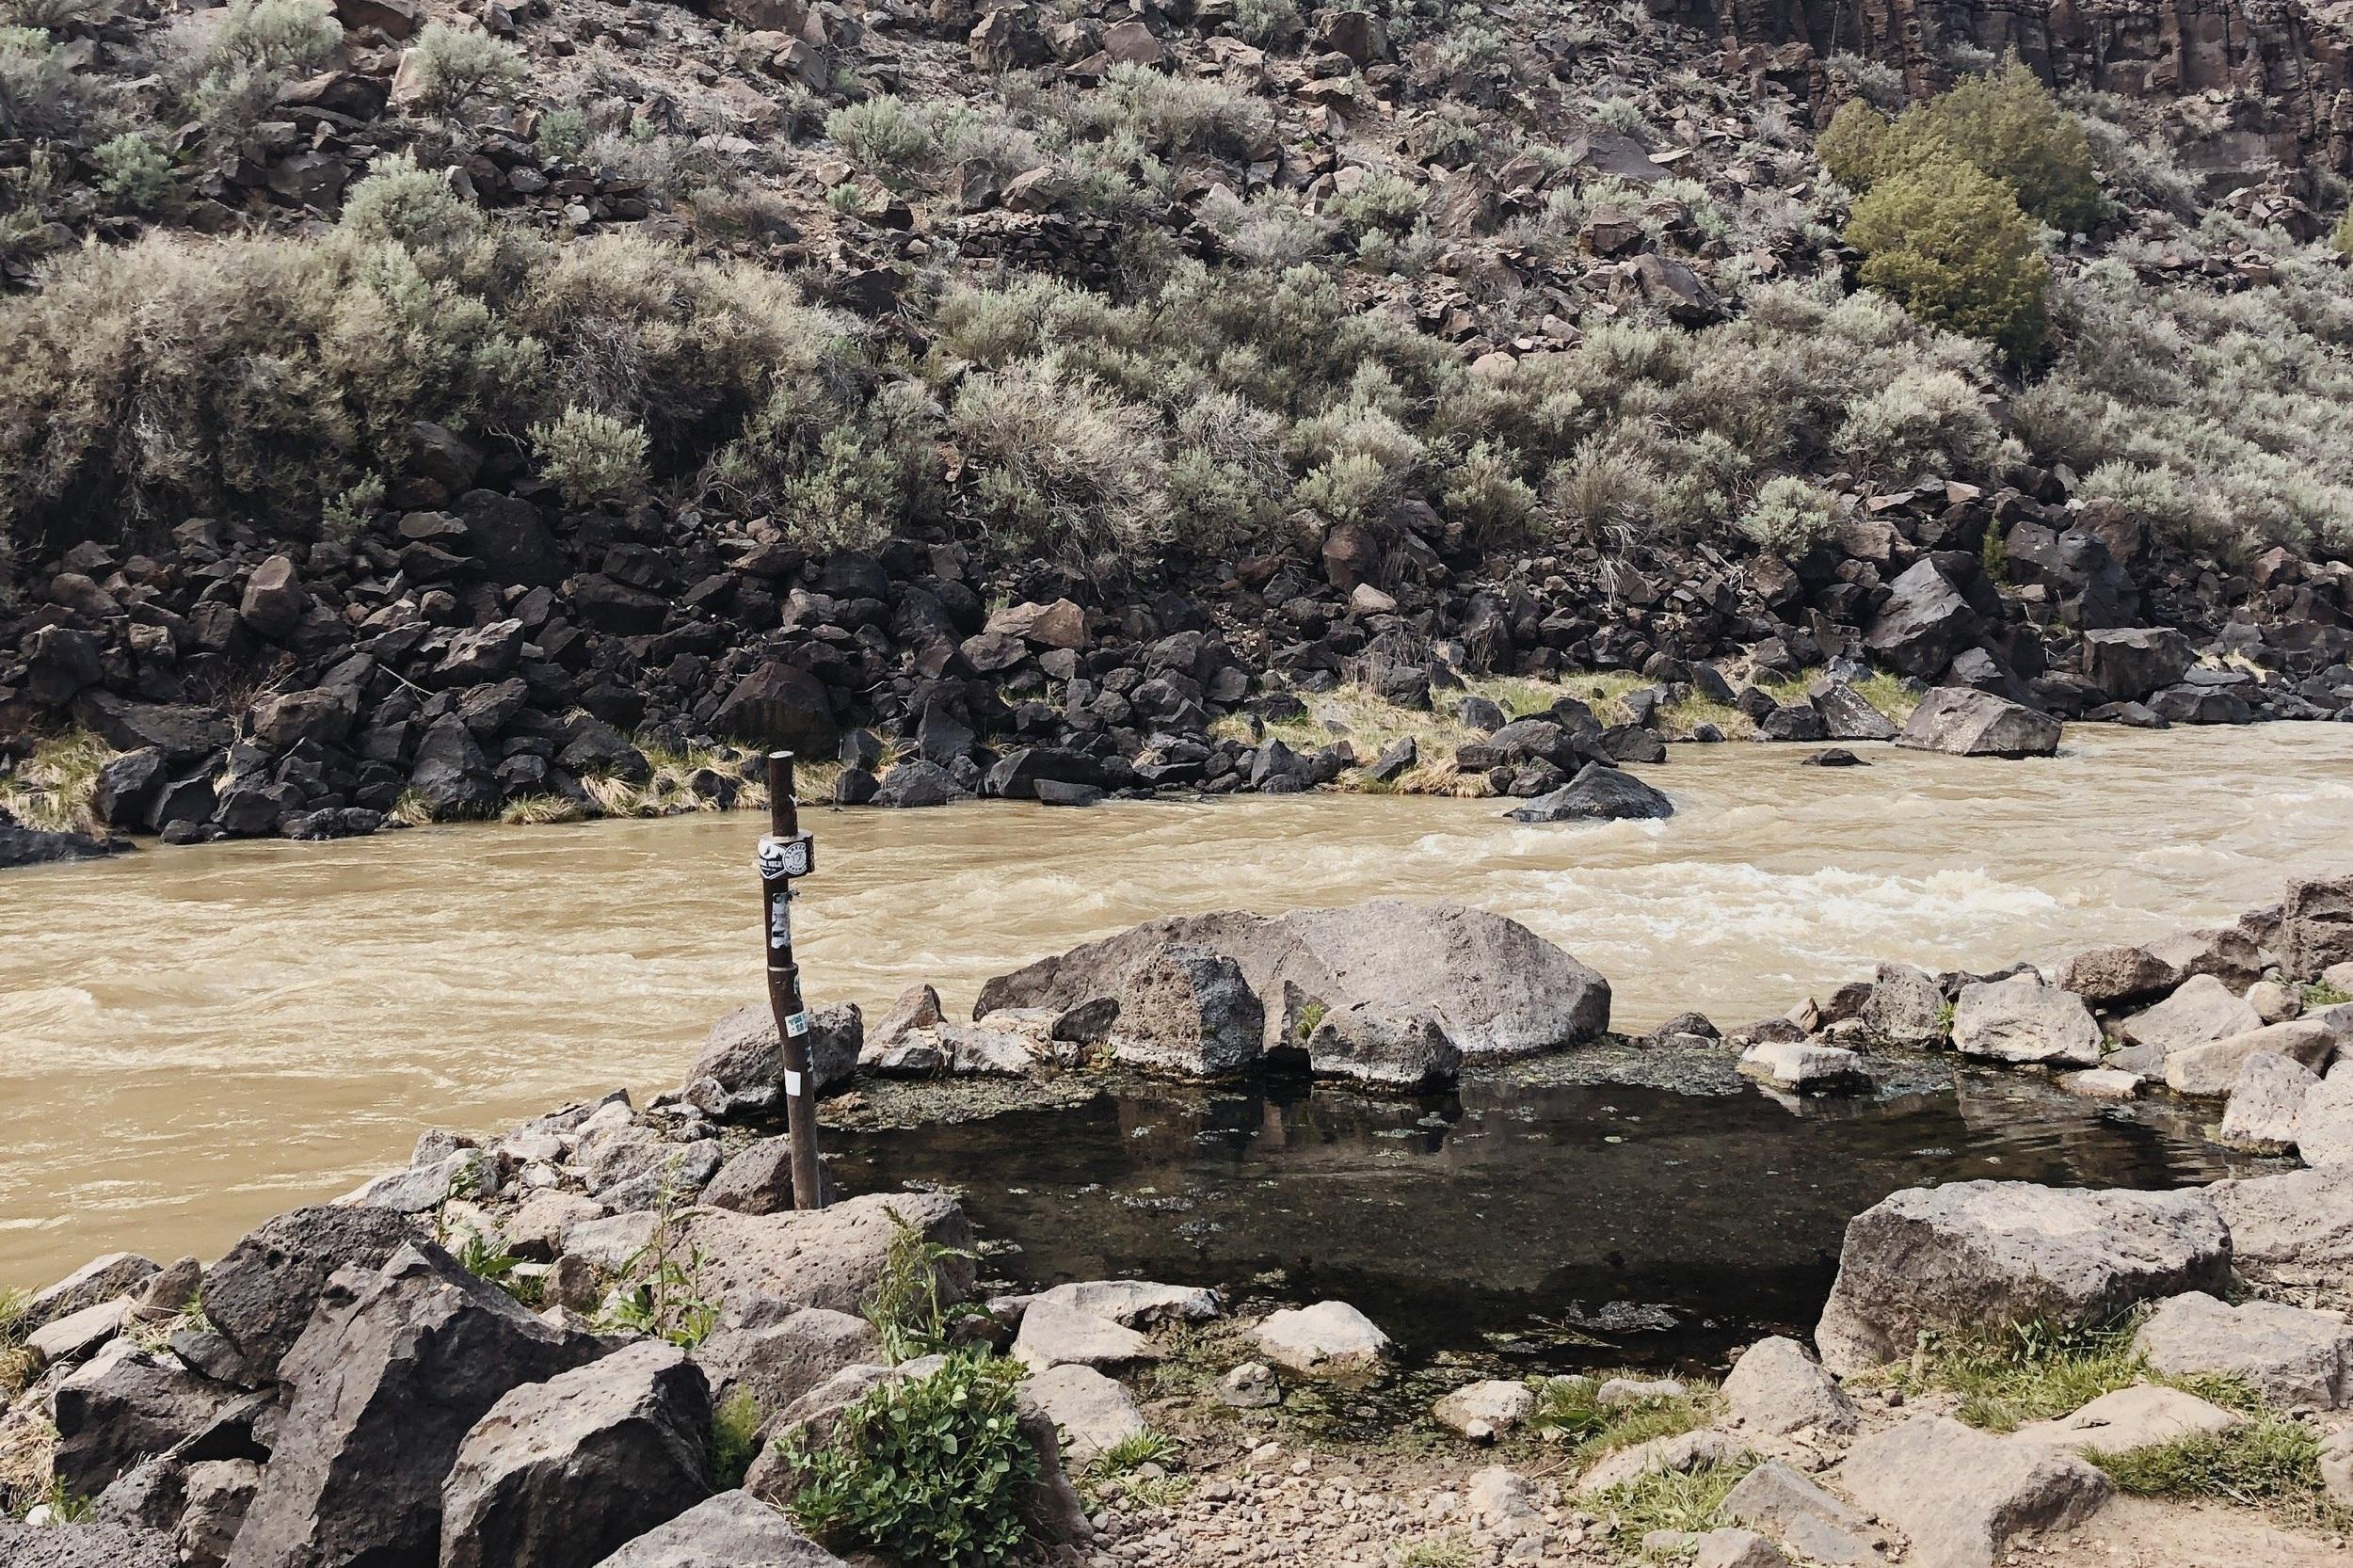 Wild hot springs - somewhere near Taos.